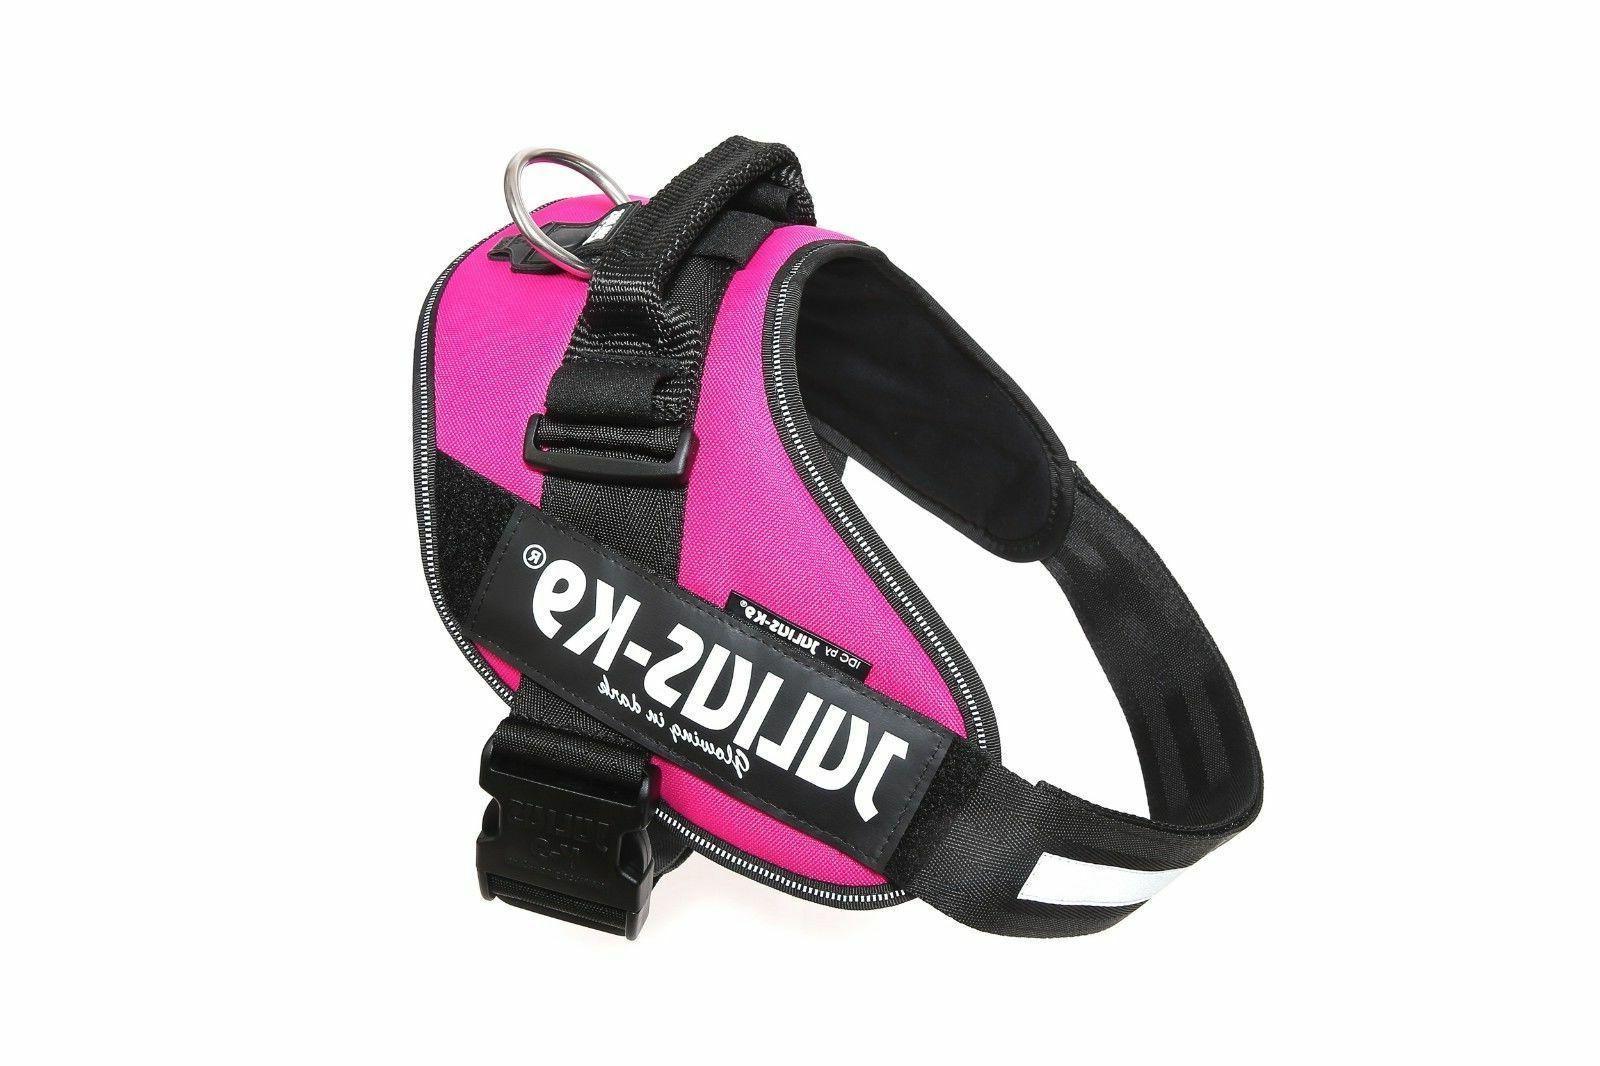 Julius K9 IDC Powerharness Dog Harness from Europe NEW dark